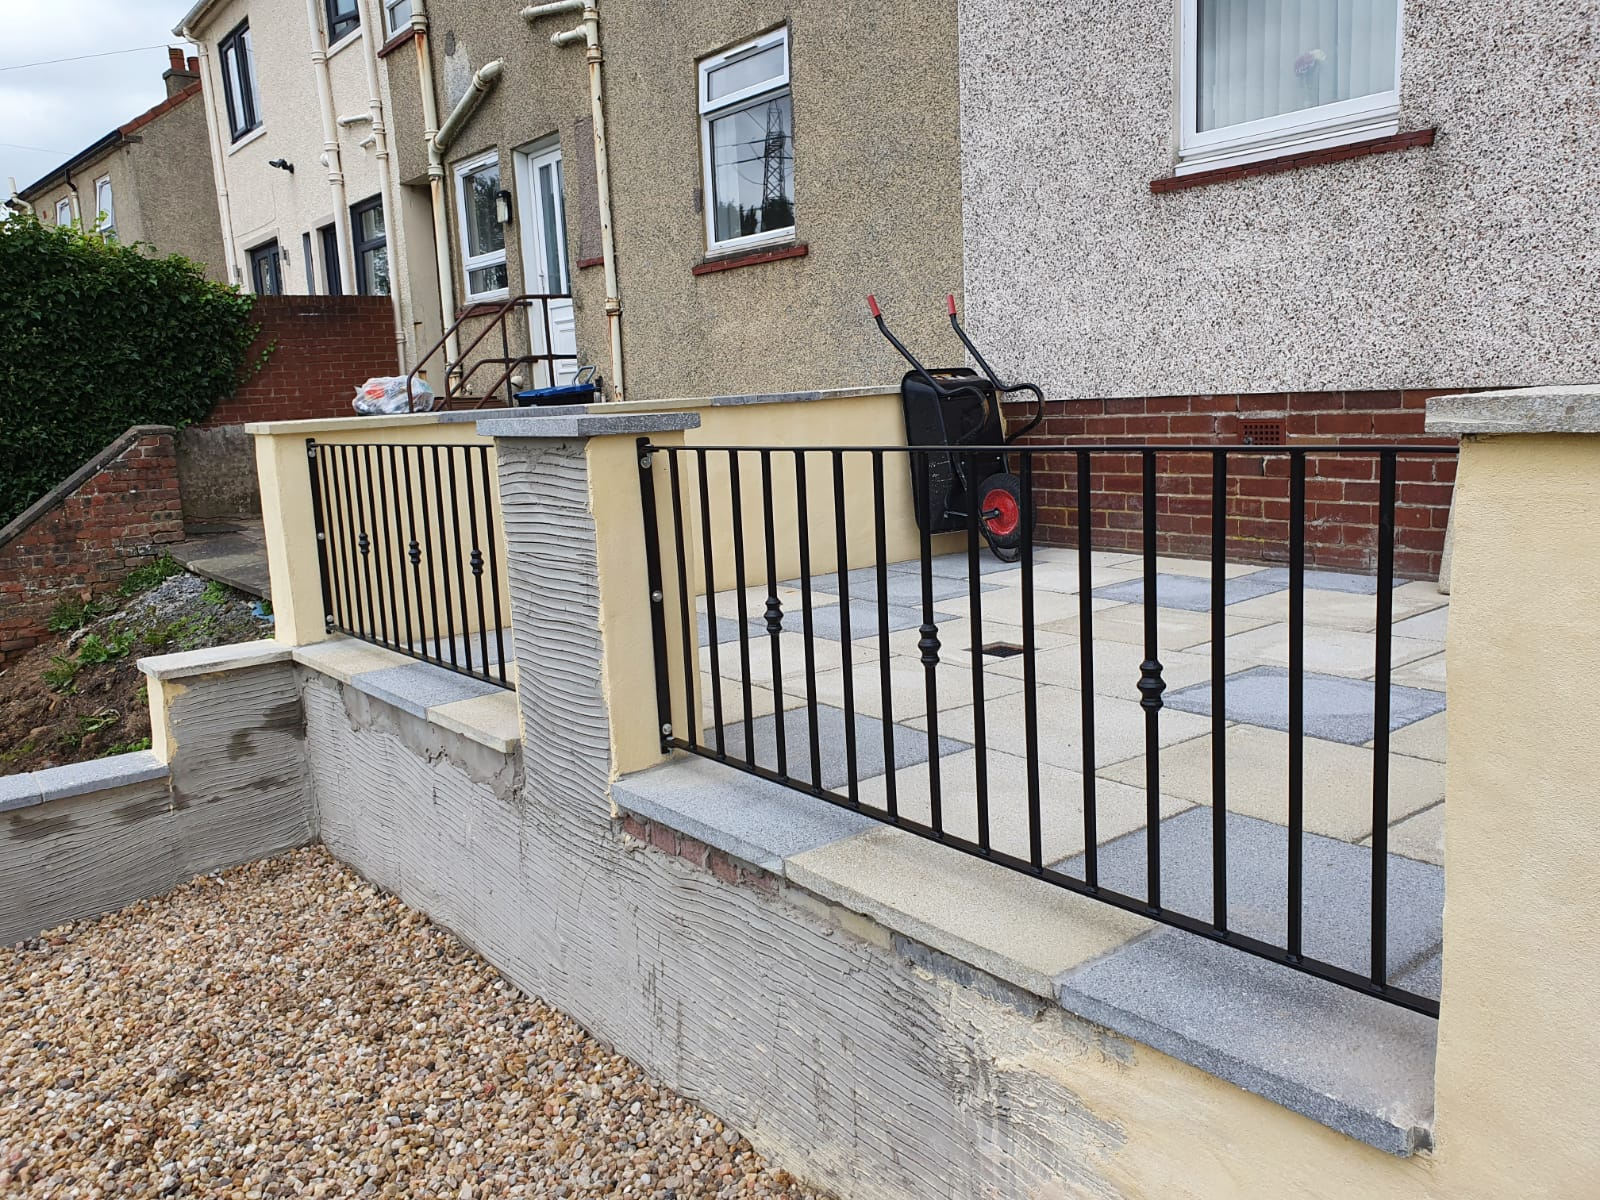 custom metal railings by Dain Art Iron, Ayrshire Scotland.